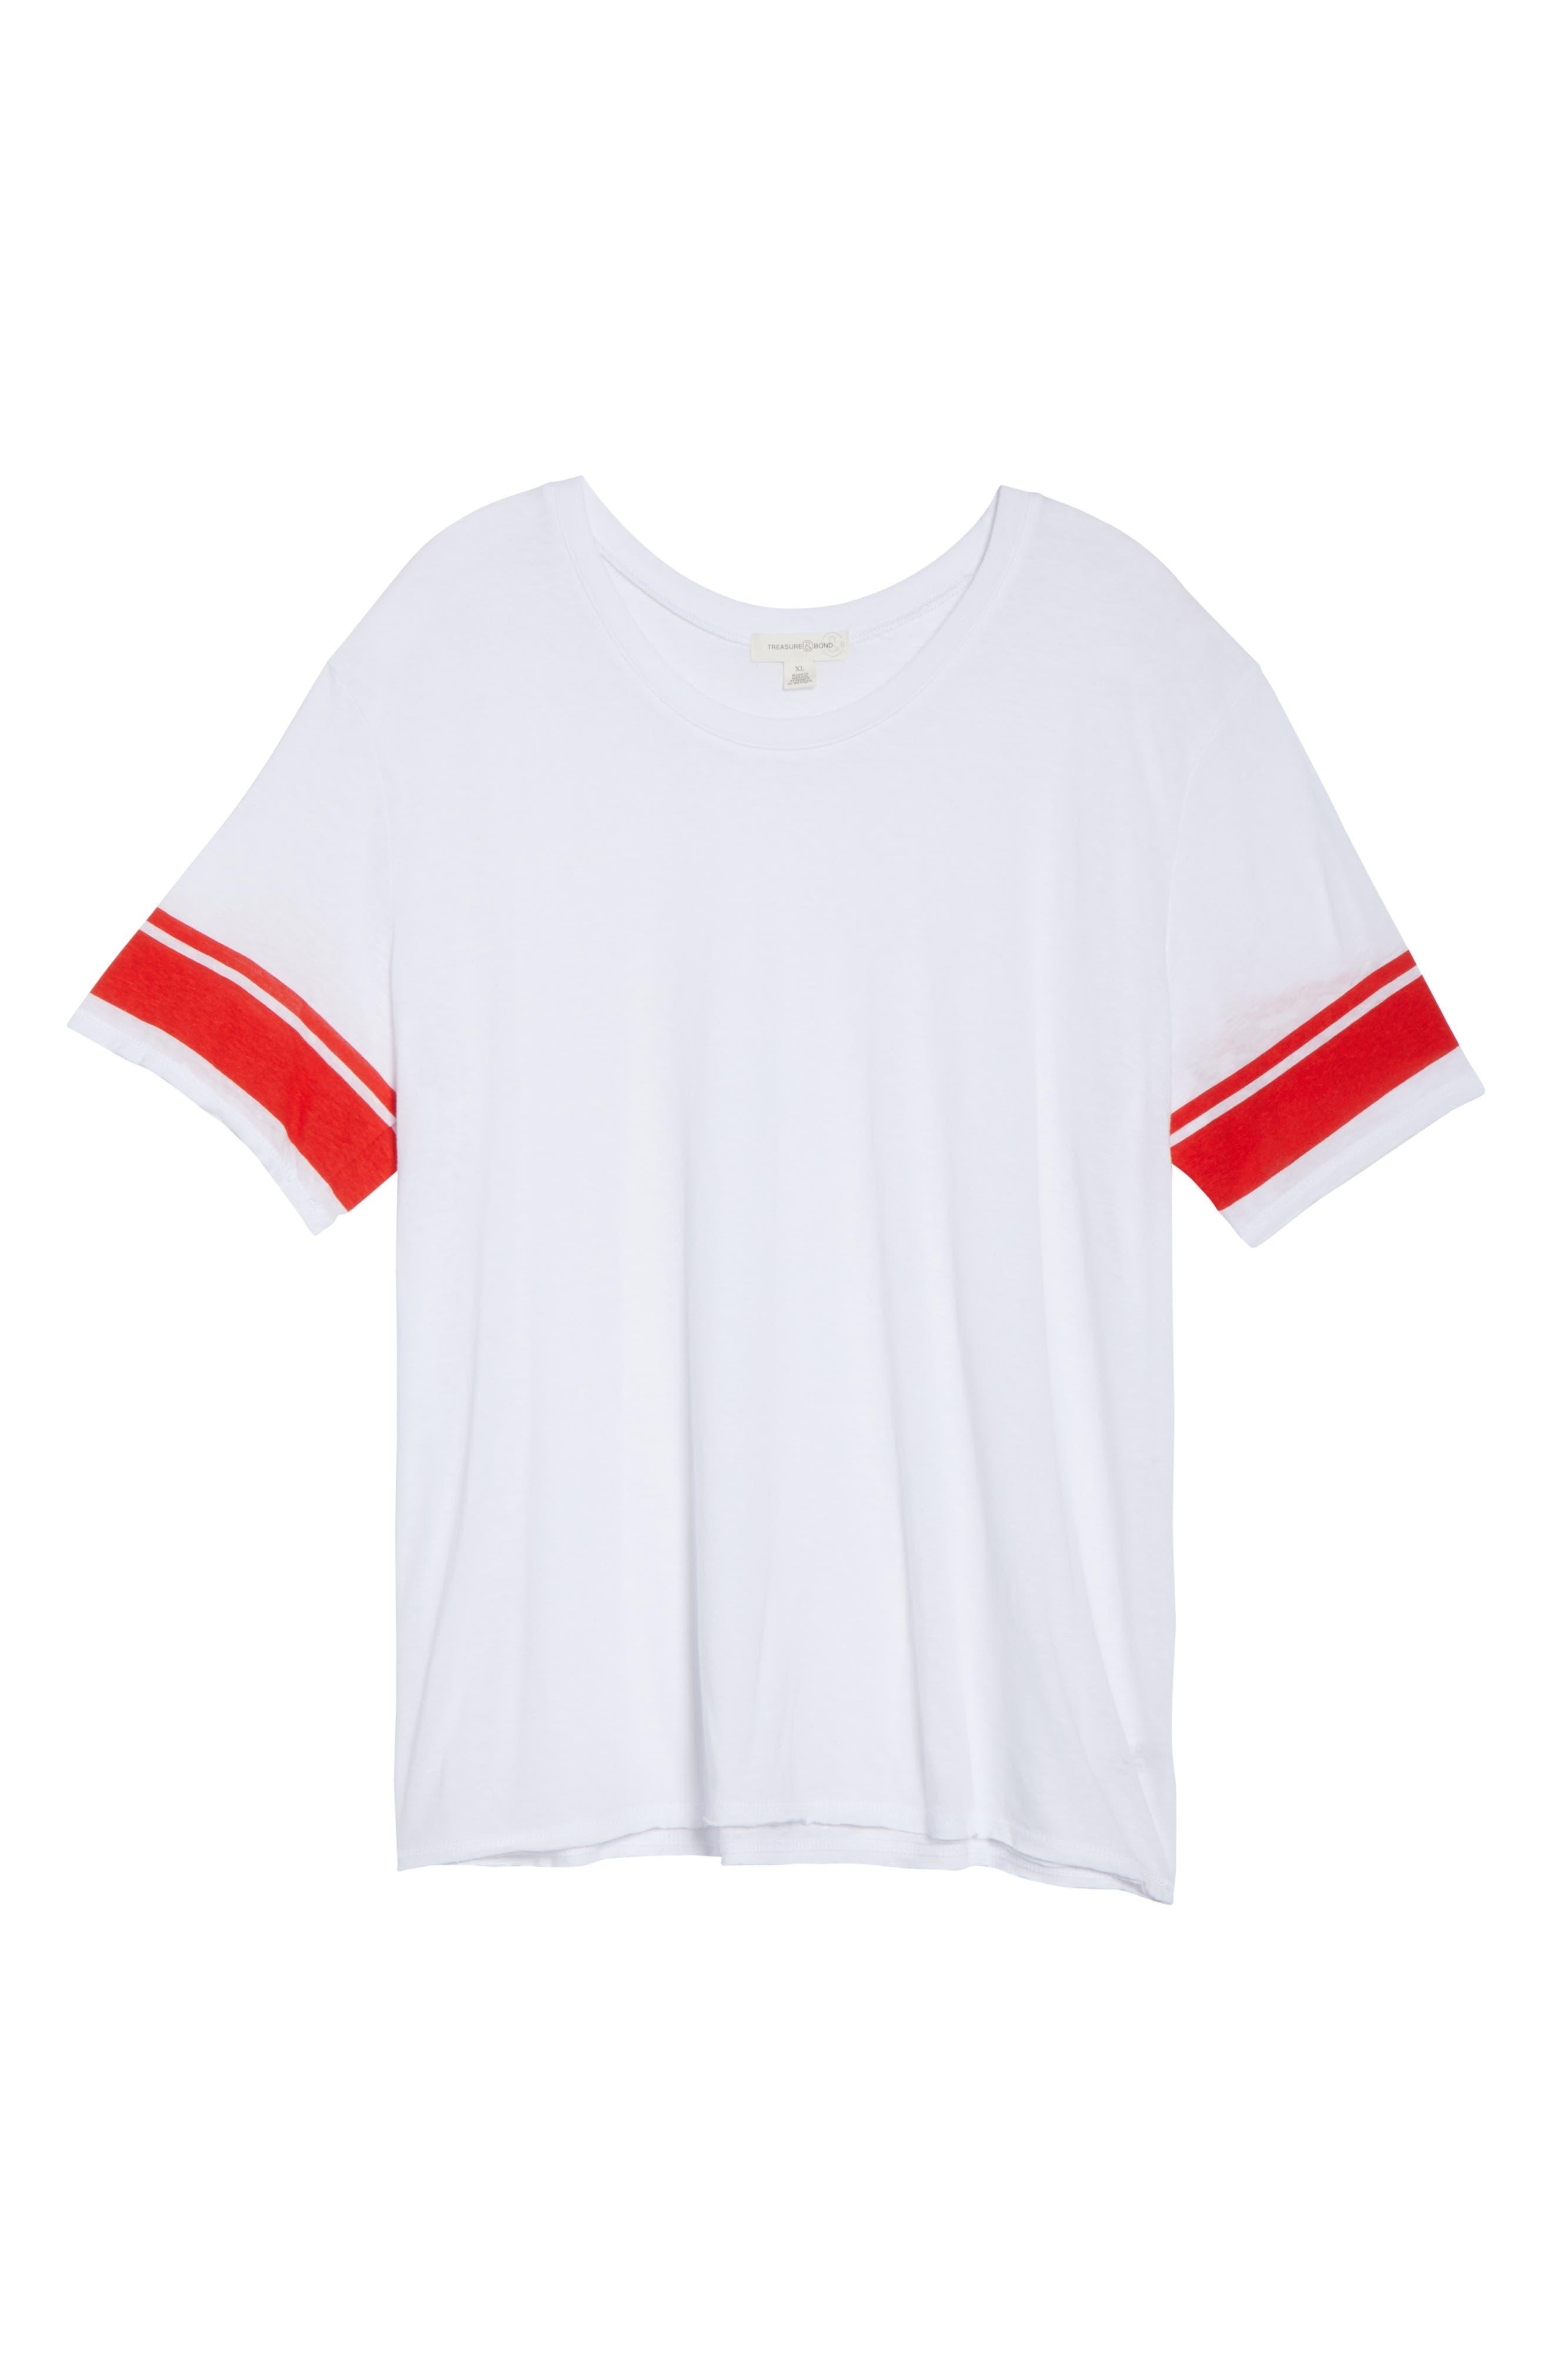 Varsity Stripe Tee,                             Alternate thumbnail 13, color,                             WHITE- RED BAROQUE COMBO